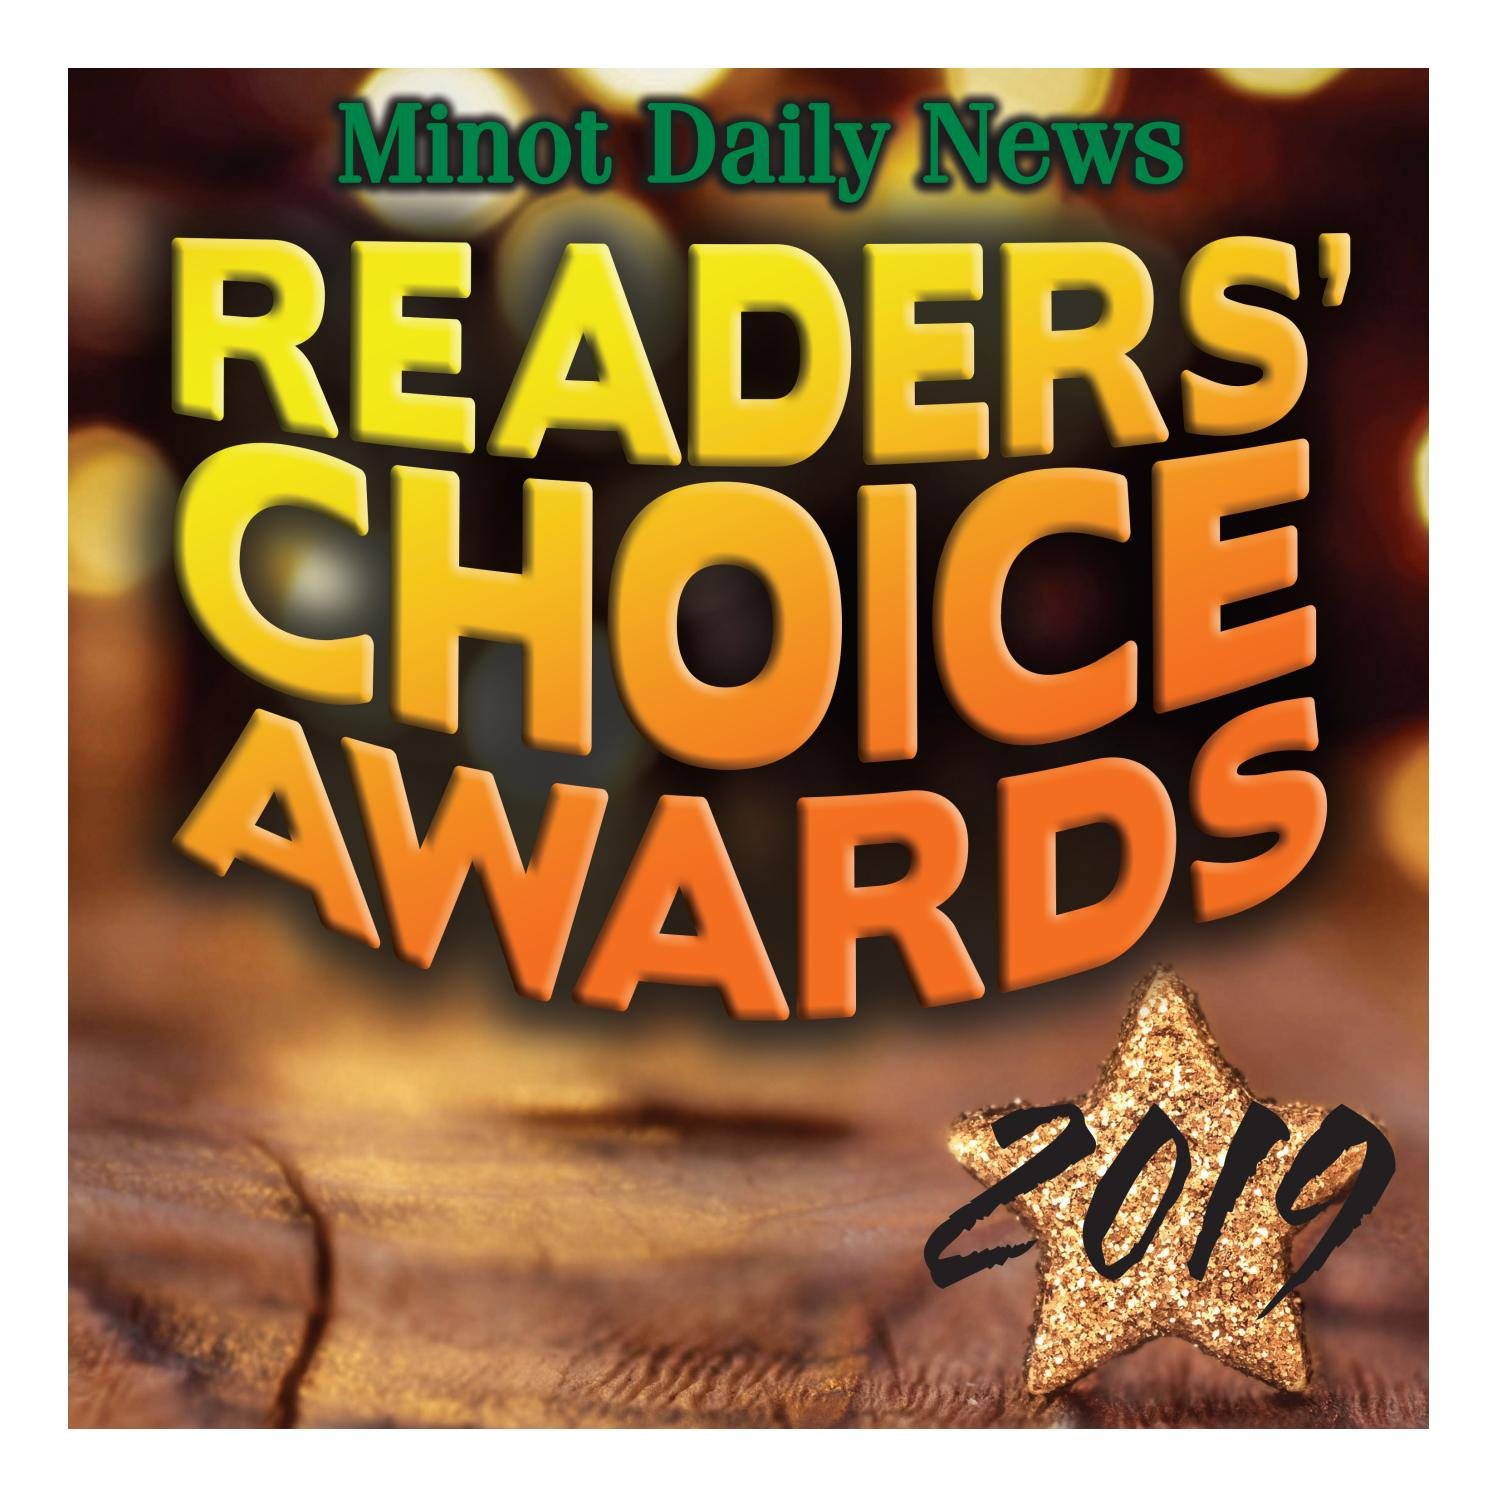 Minot Daily News Readers Choice Awards 2019 By Minotdailynews Issuu